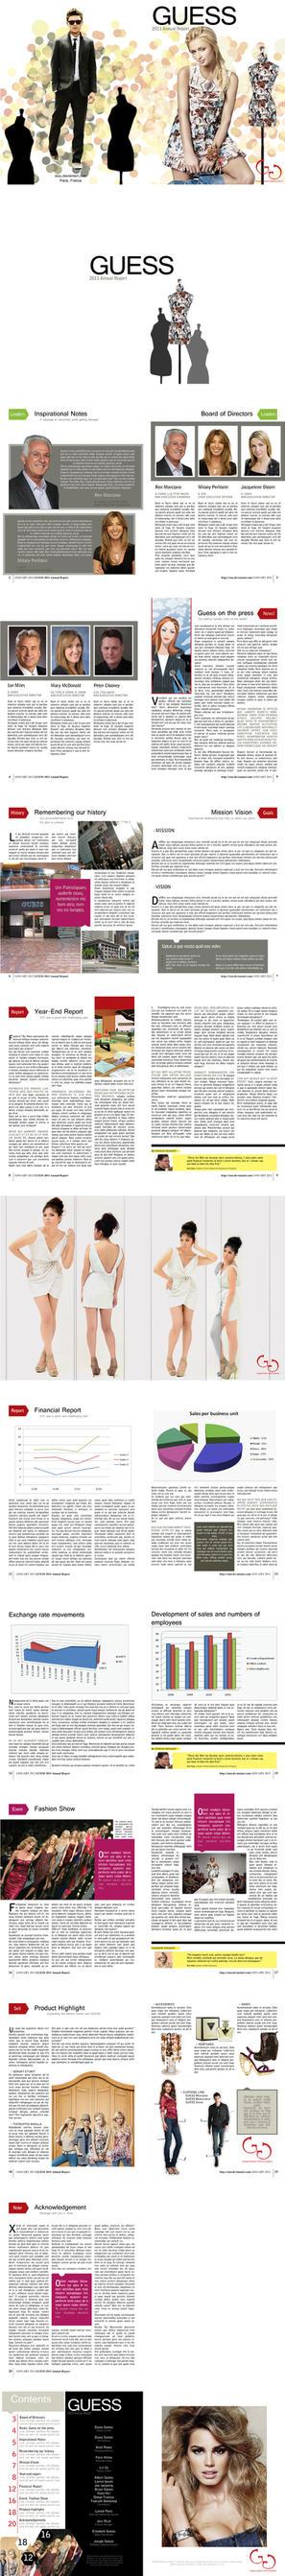 Annual Report Magazine under Professor Ariel Ponce by eizu